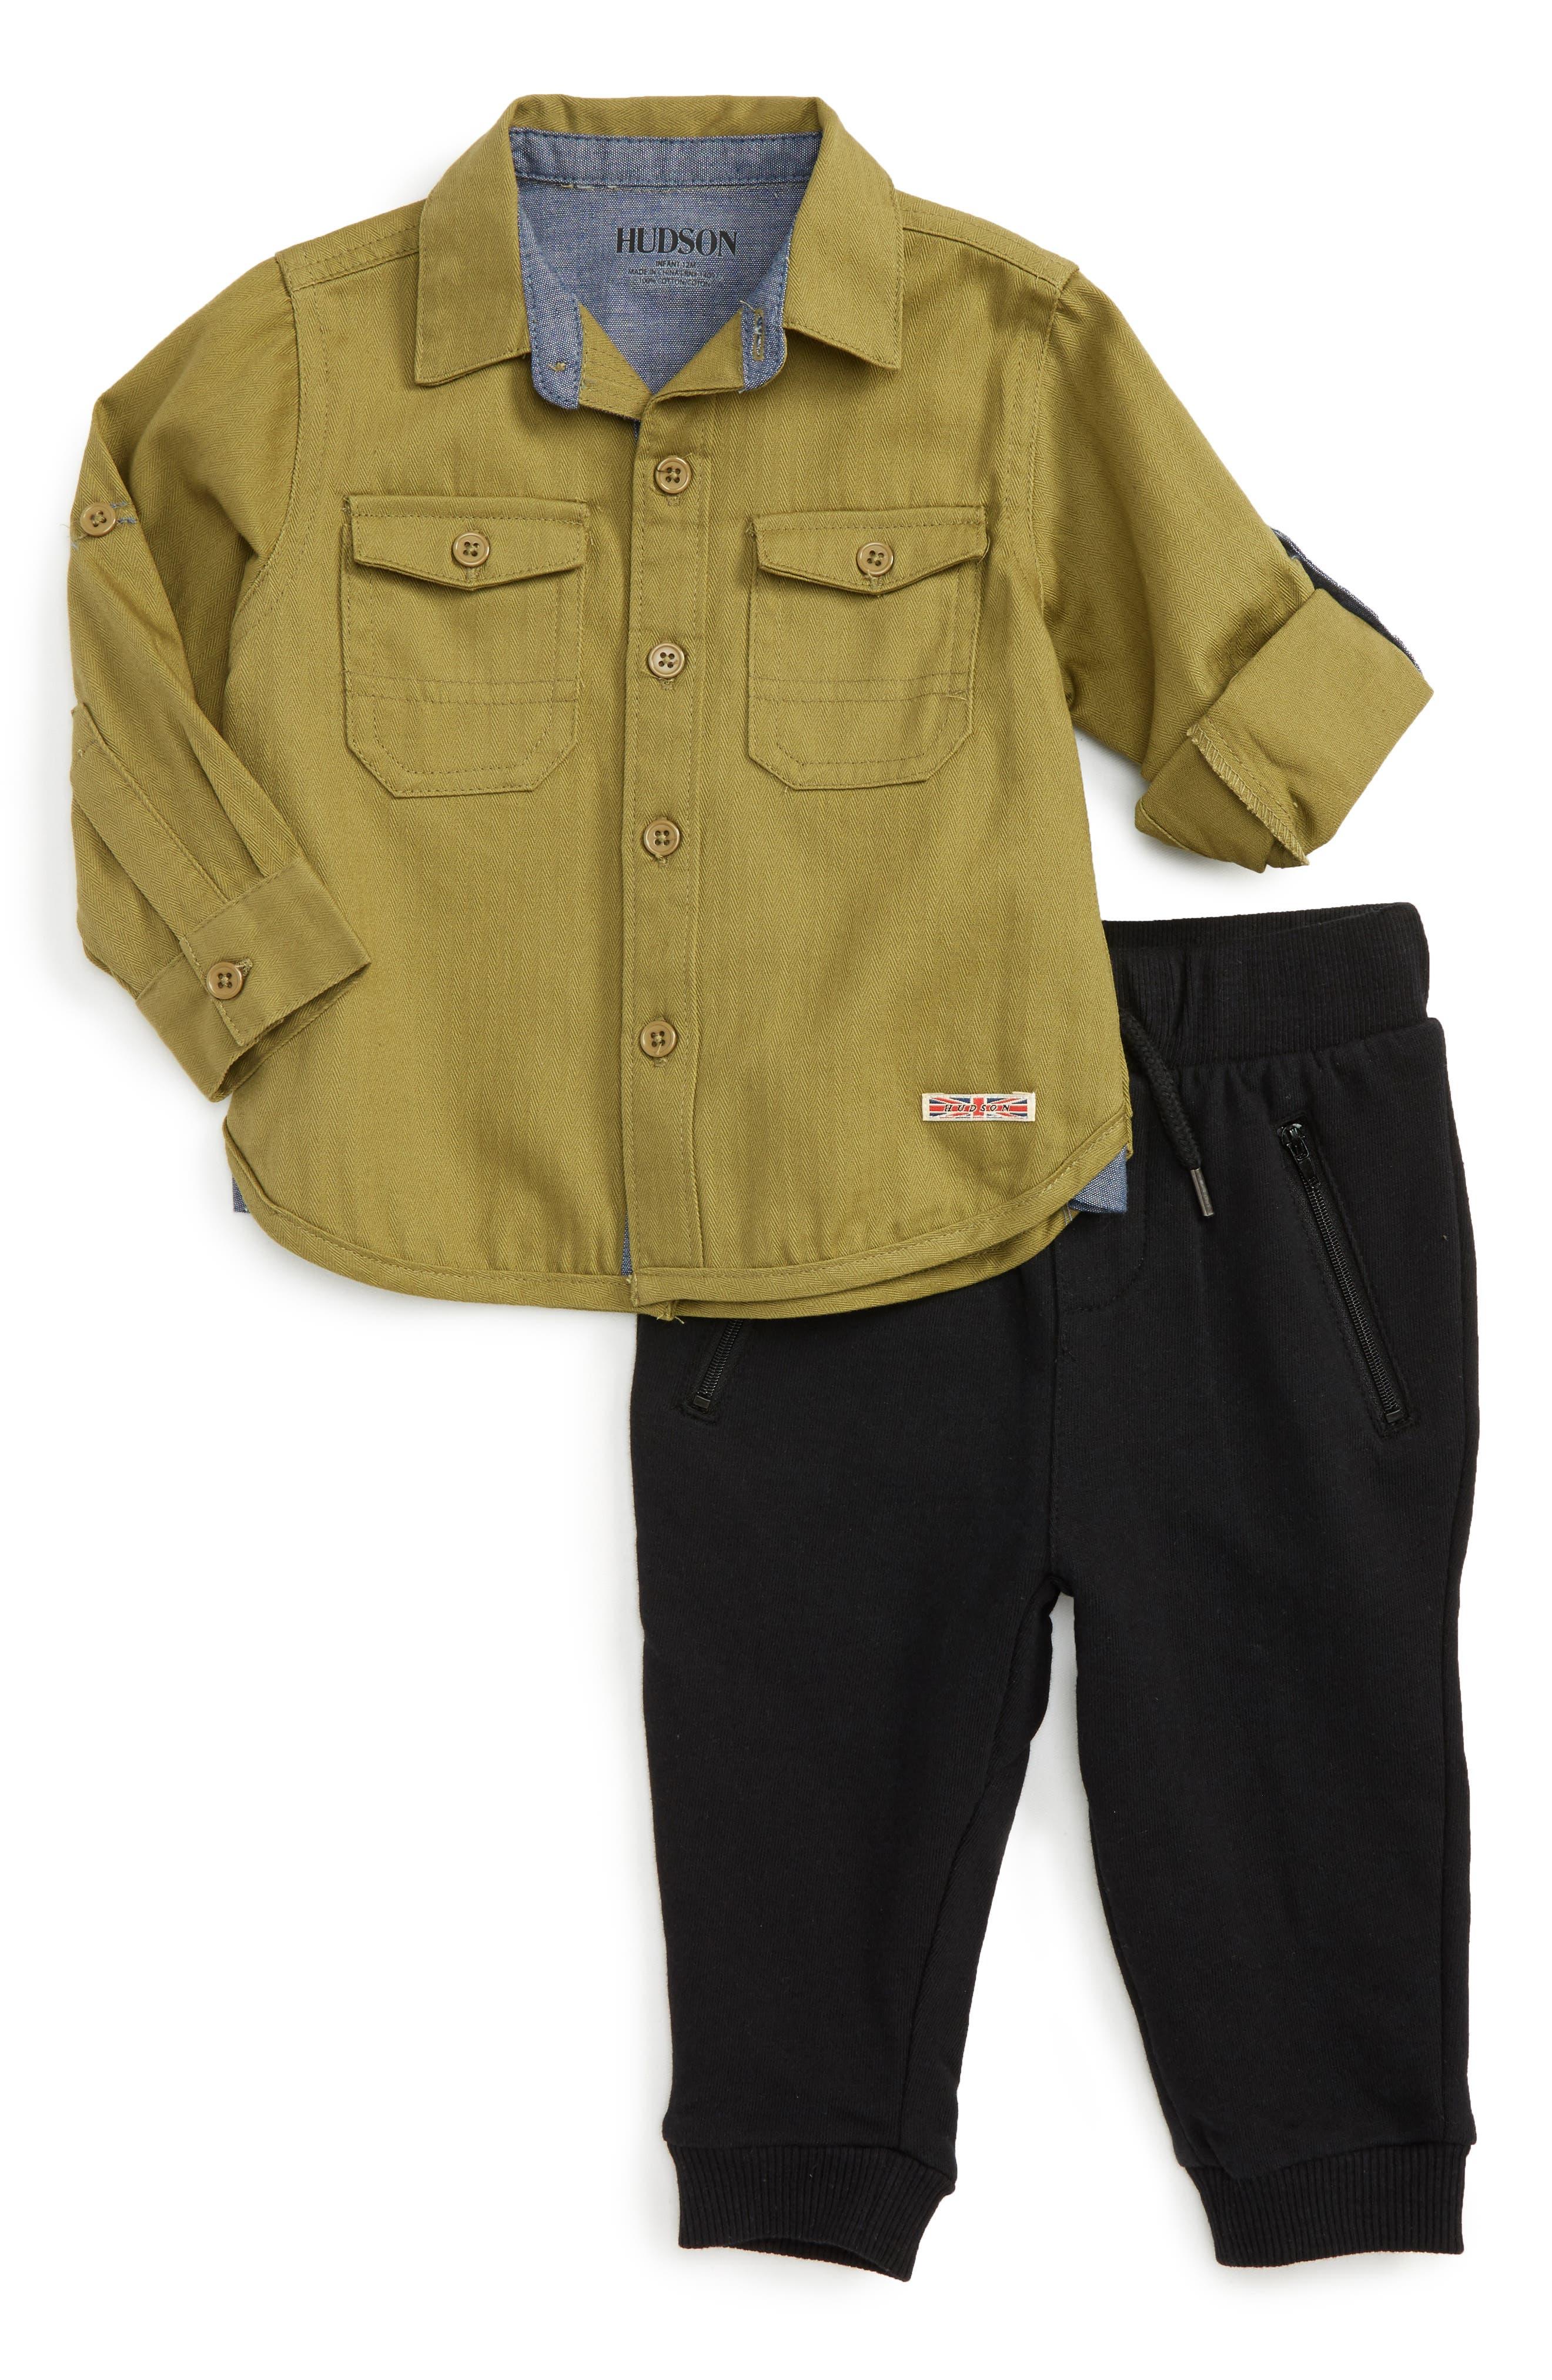 Alternate Image 1 Selected - Hudson Kids Woven Shirt & Sweatpants Set (Baby Boys)